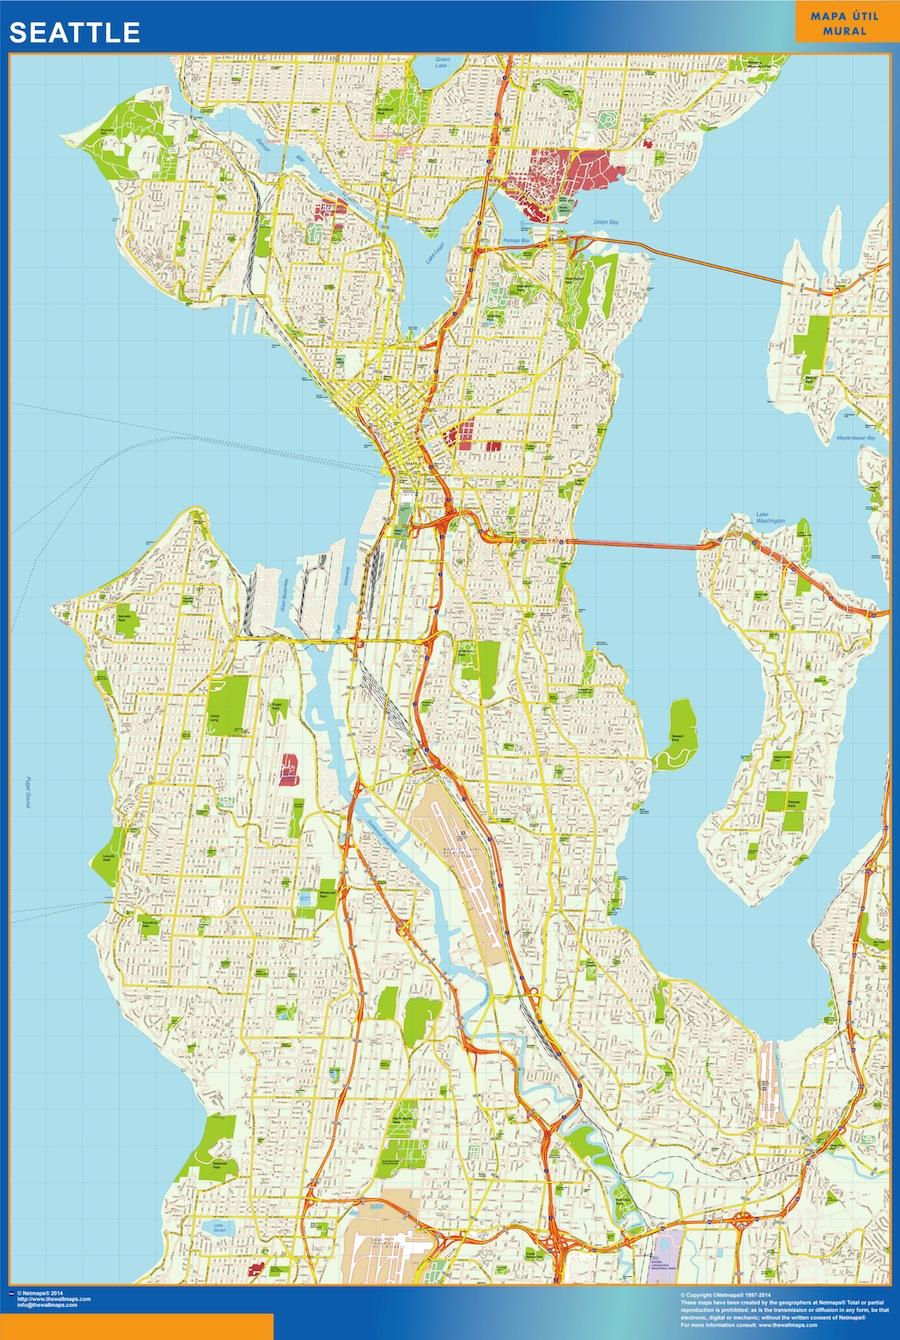 Mapa de Seattle plastificado gigante